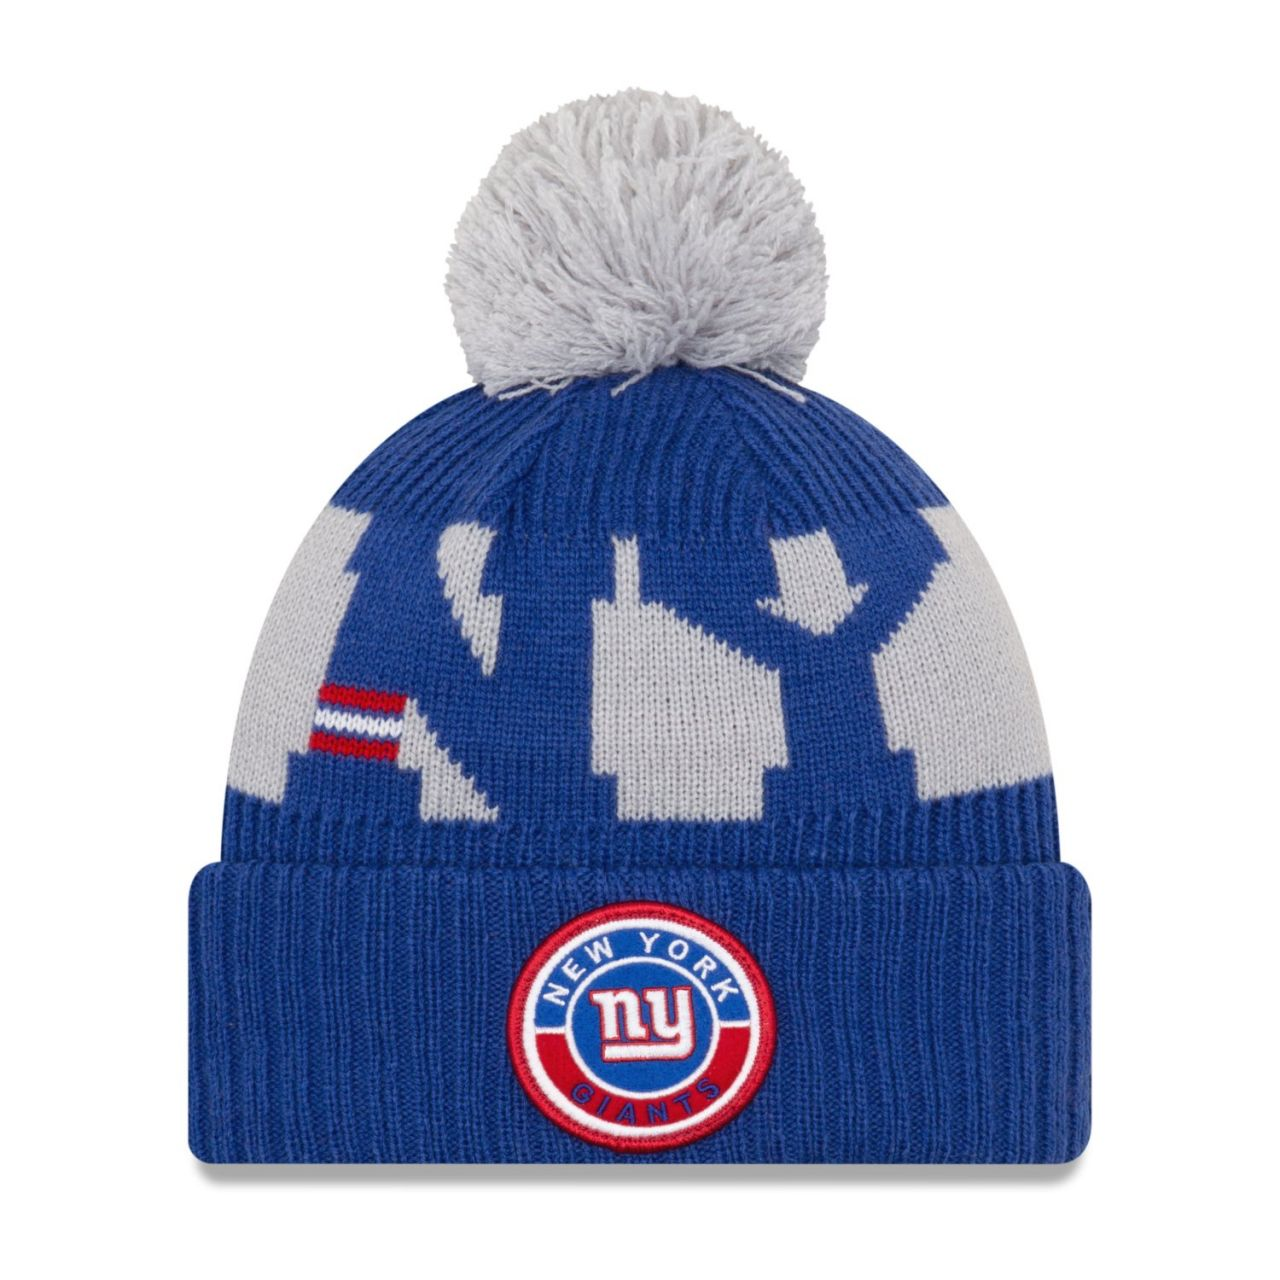 amfoo - New Era NFL ON-FIELD Sideline Kinder Mütze New York Giants